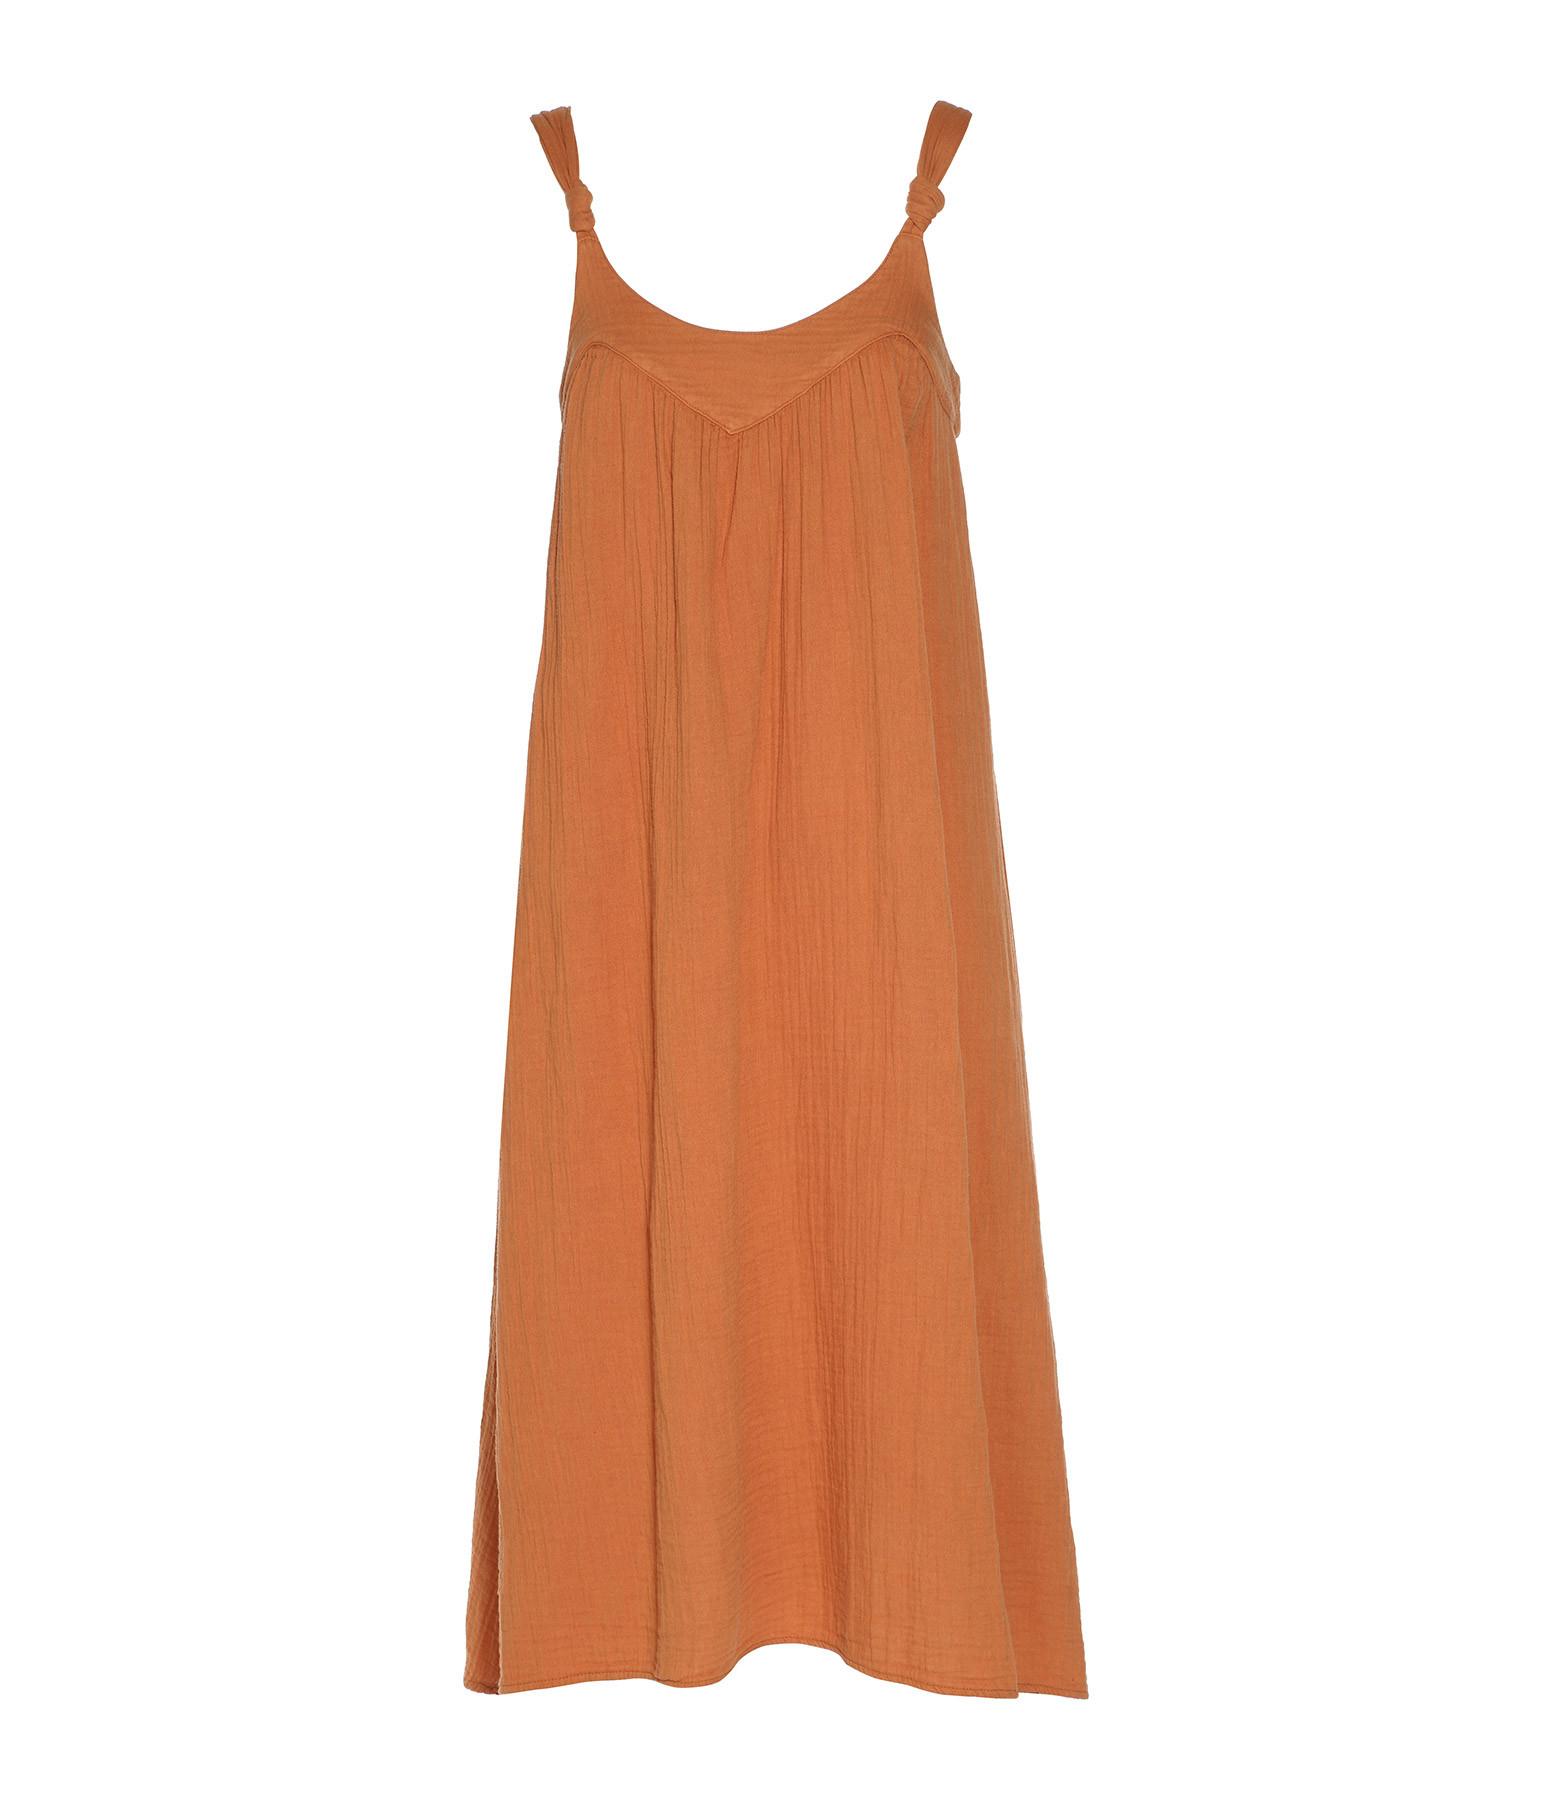 c0d180ef0f0 XIRENA - Robe Chelsea Gauze Rumi Camel